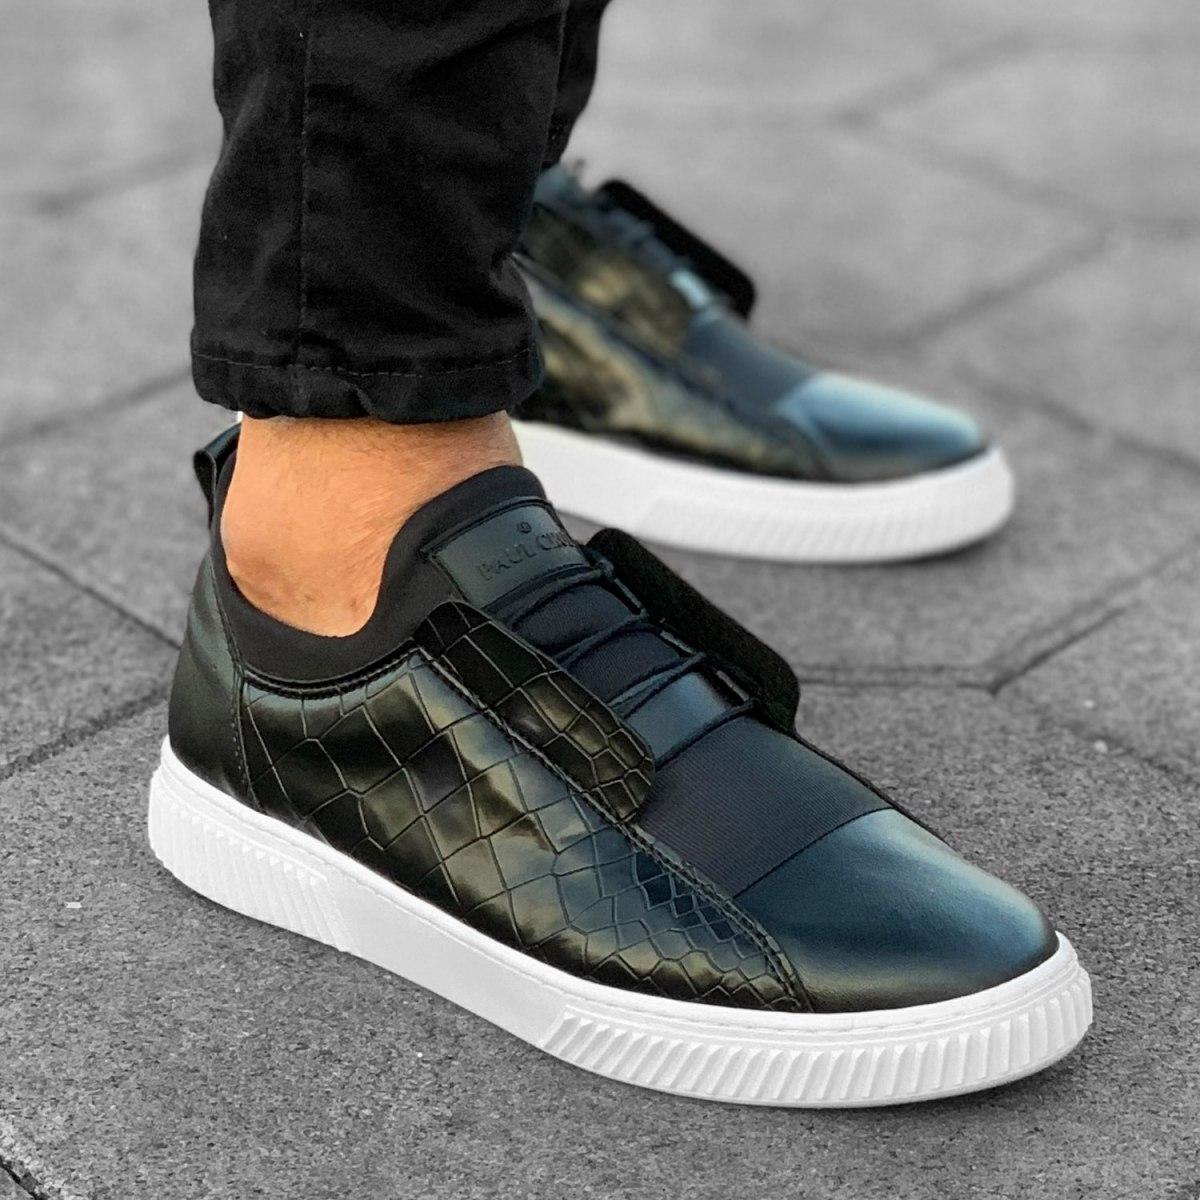 Croco Design Sneakers In Black Mv Premium Brand - 4